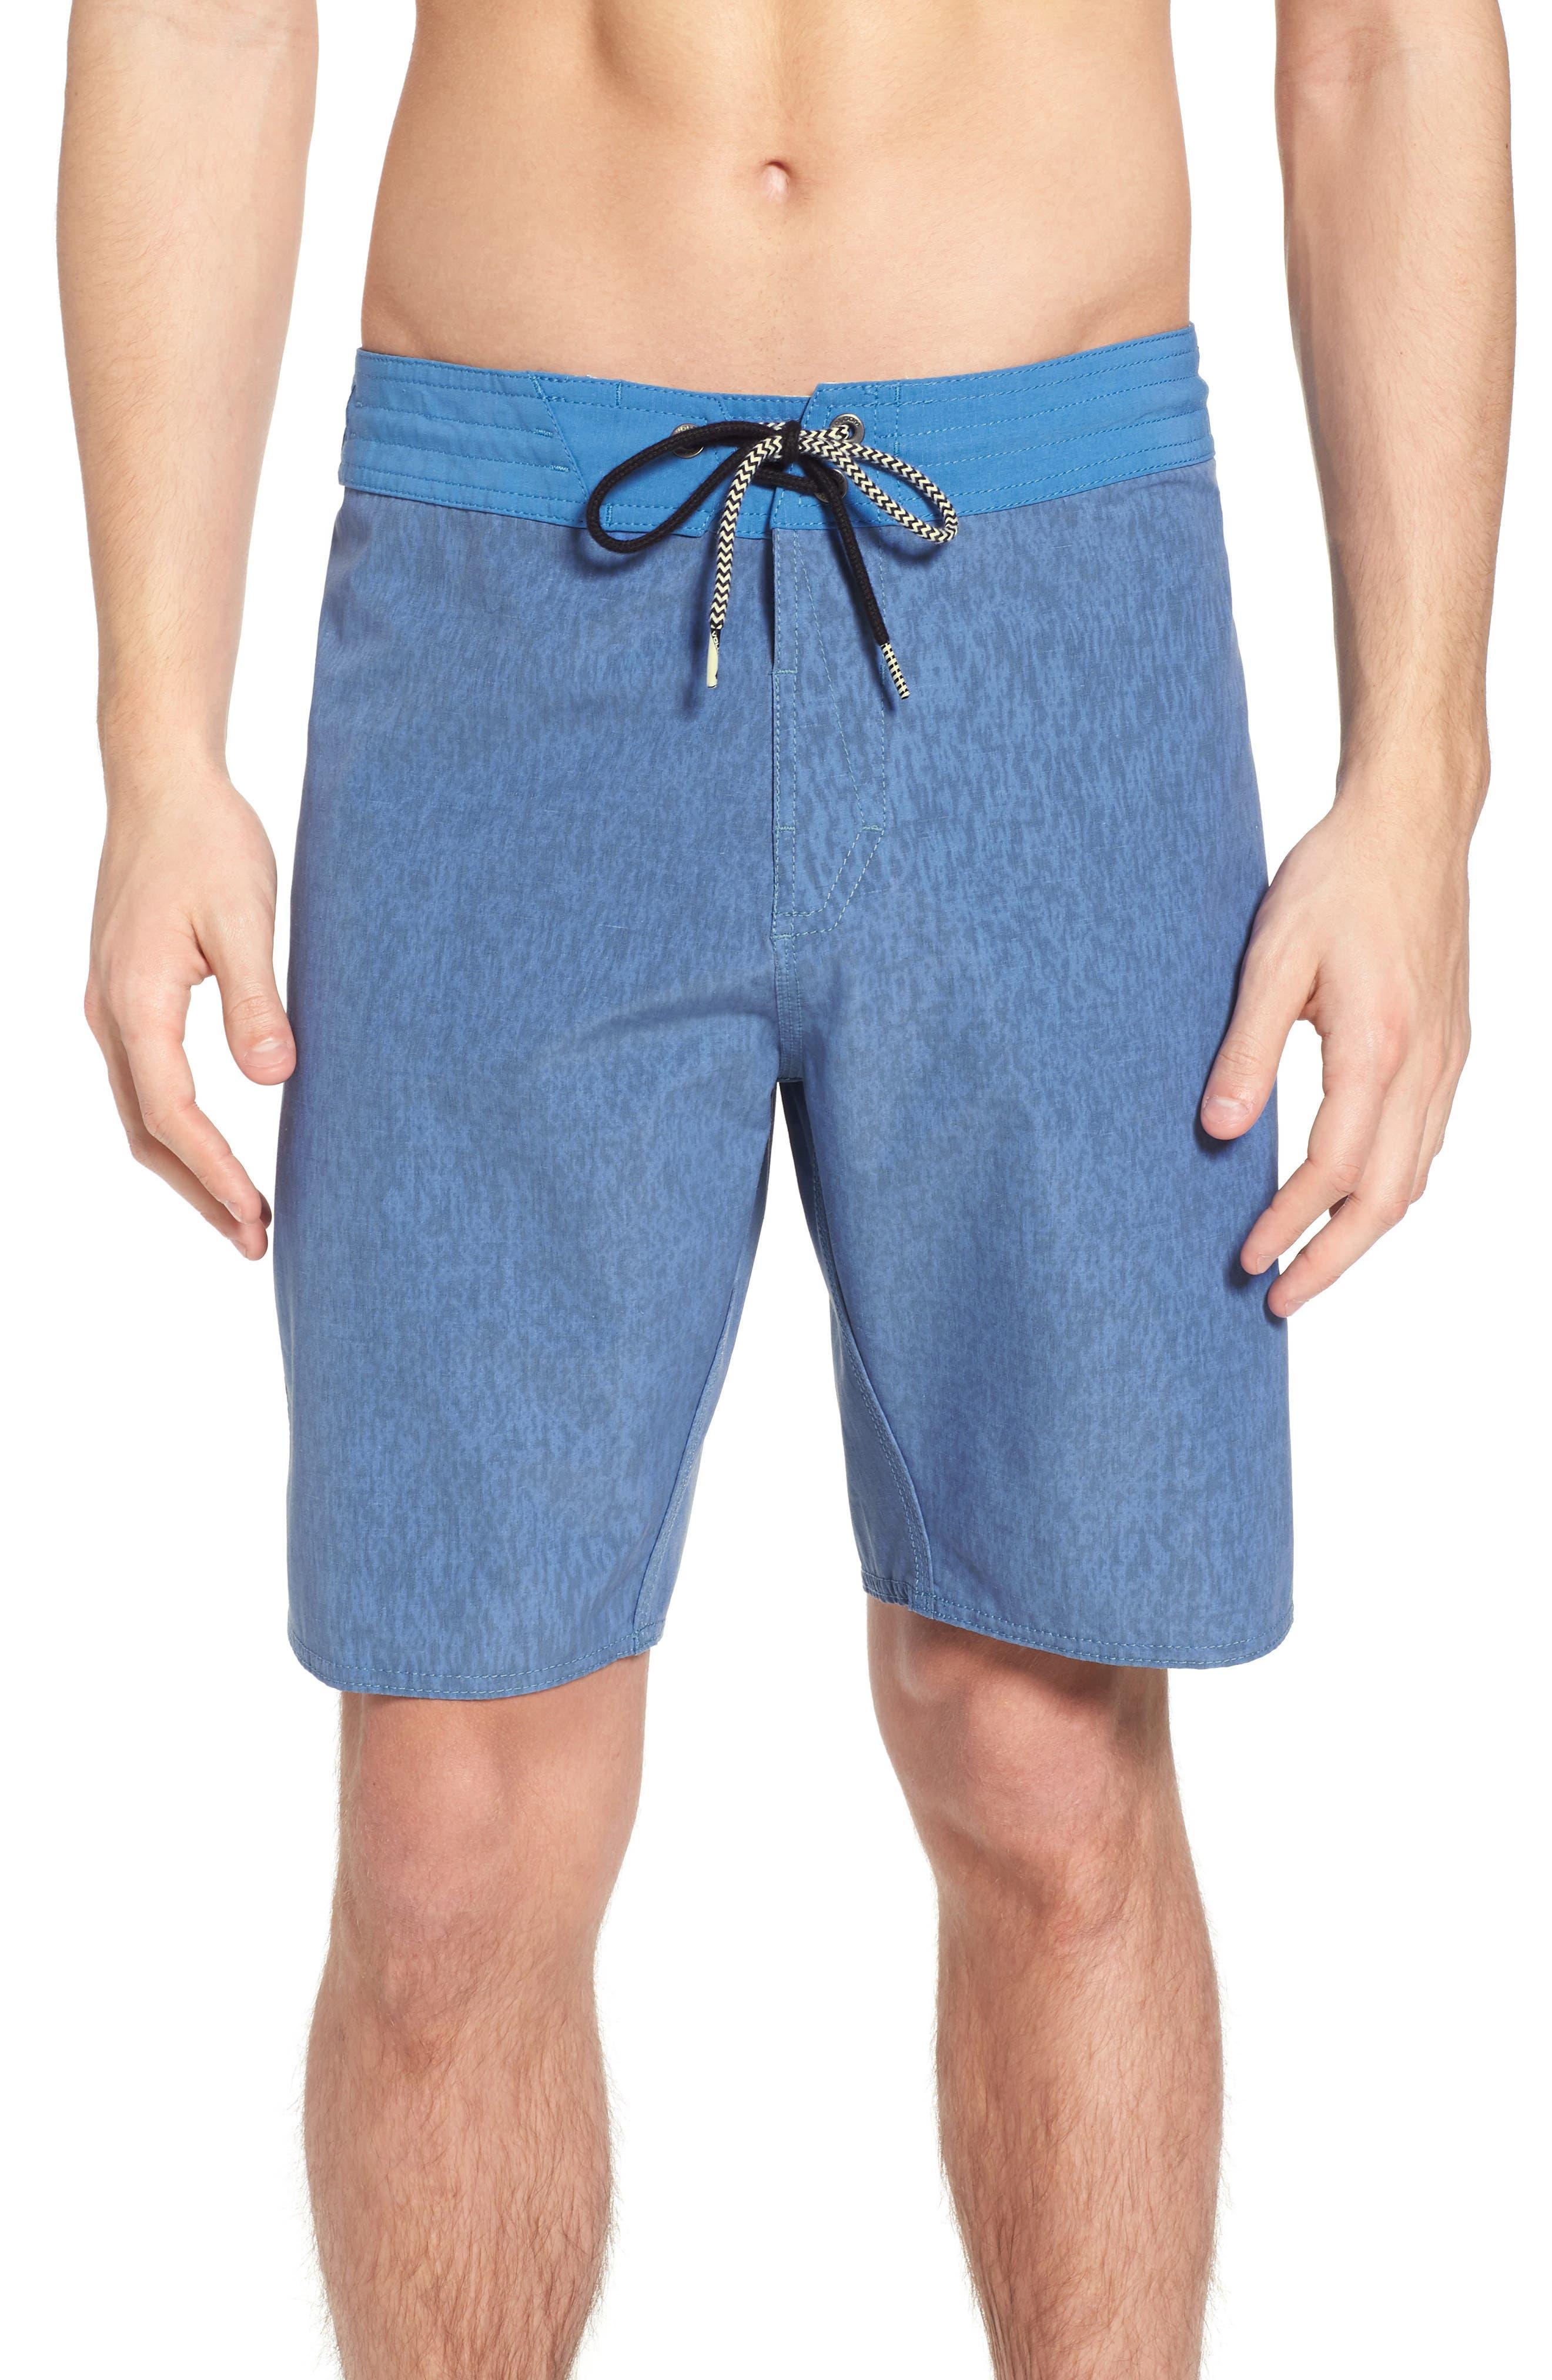 Side Fi Stoney Board Shorts,                             Main thumbnail 1, color,                             Blue Free